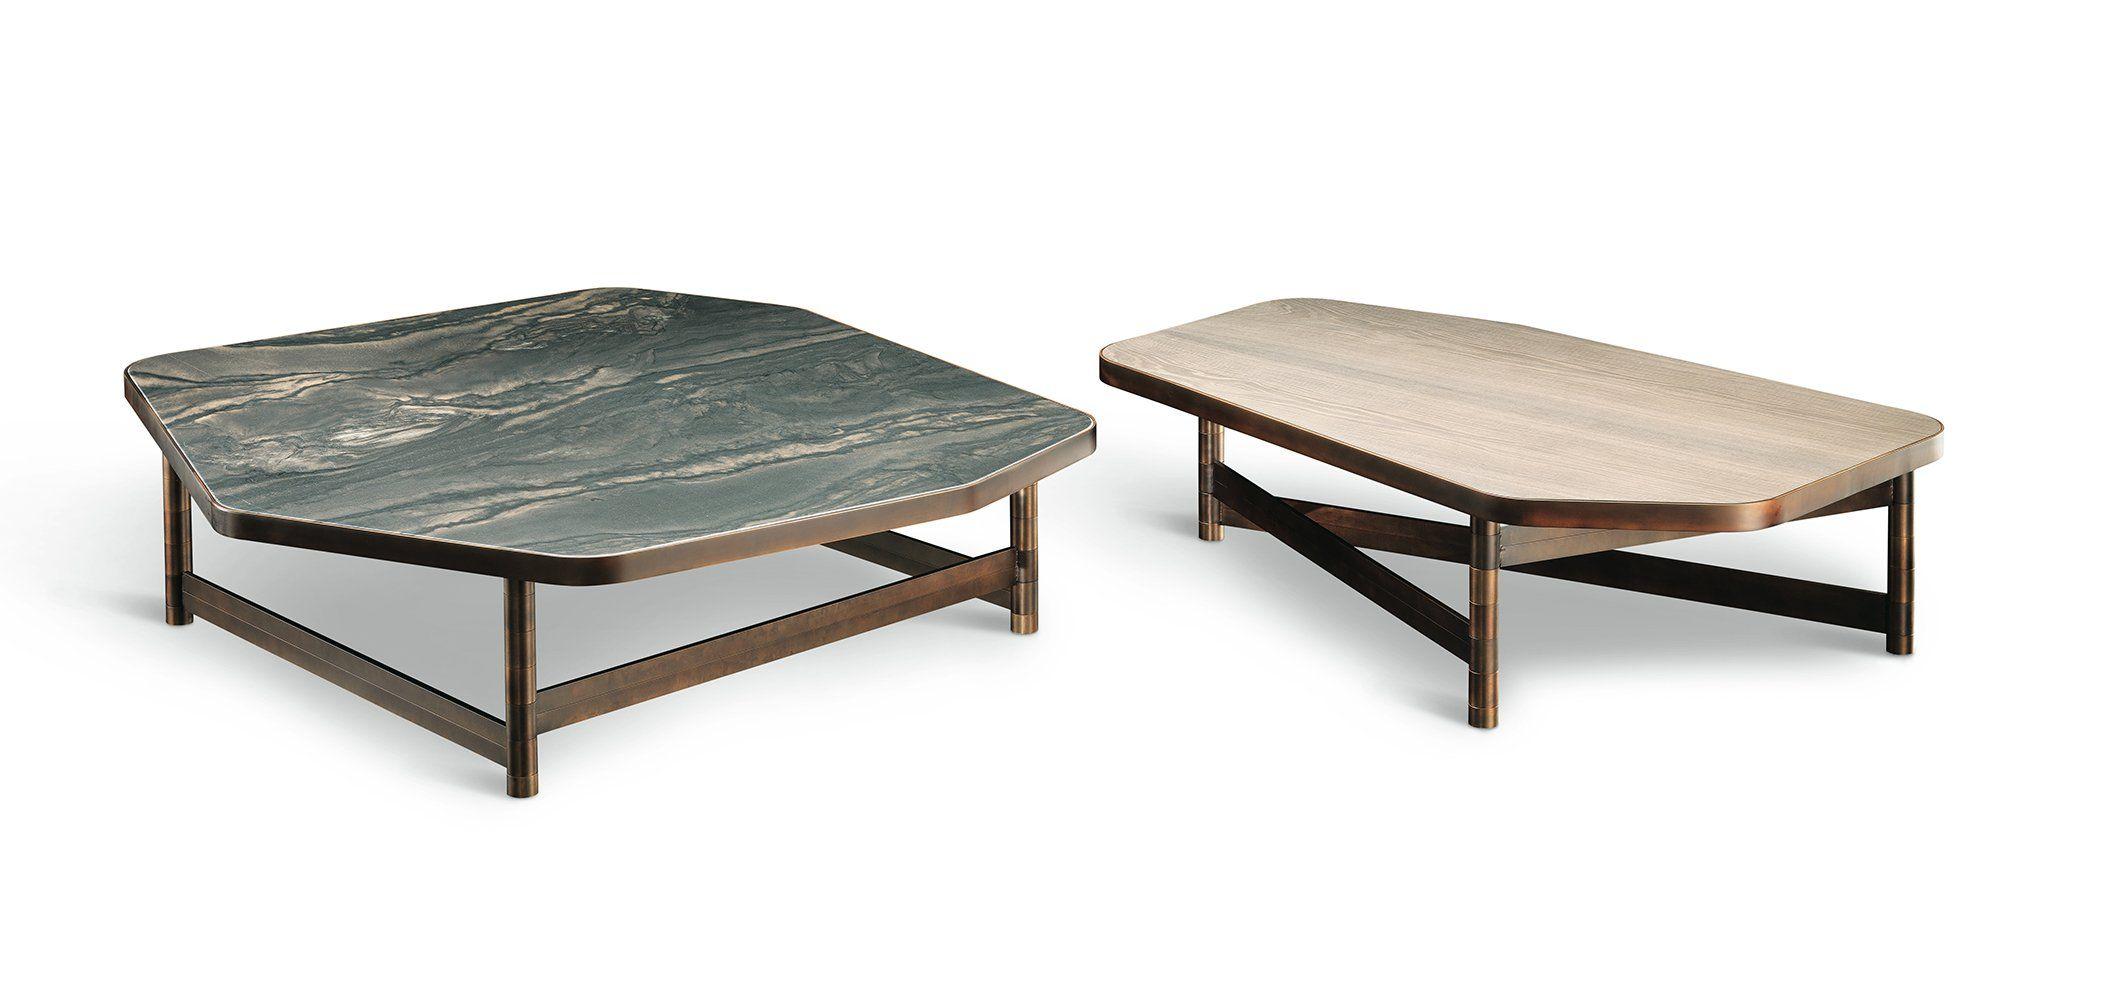 Henge Or Table Coffee Table Oriental Table Furniture Furniture [ 1002 x 2112 Pixel ]